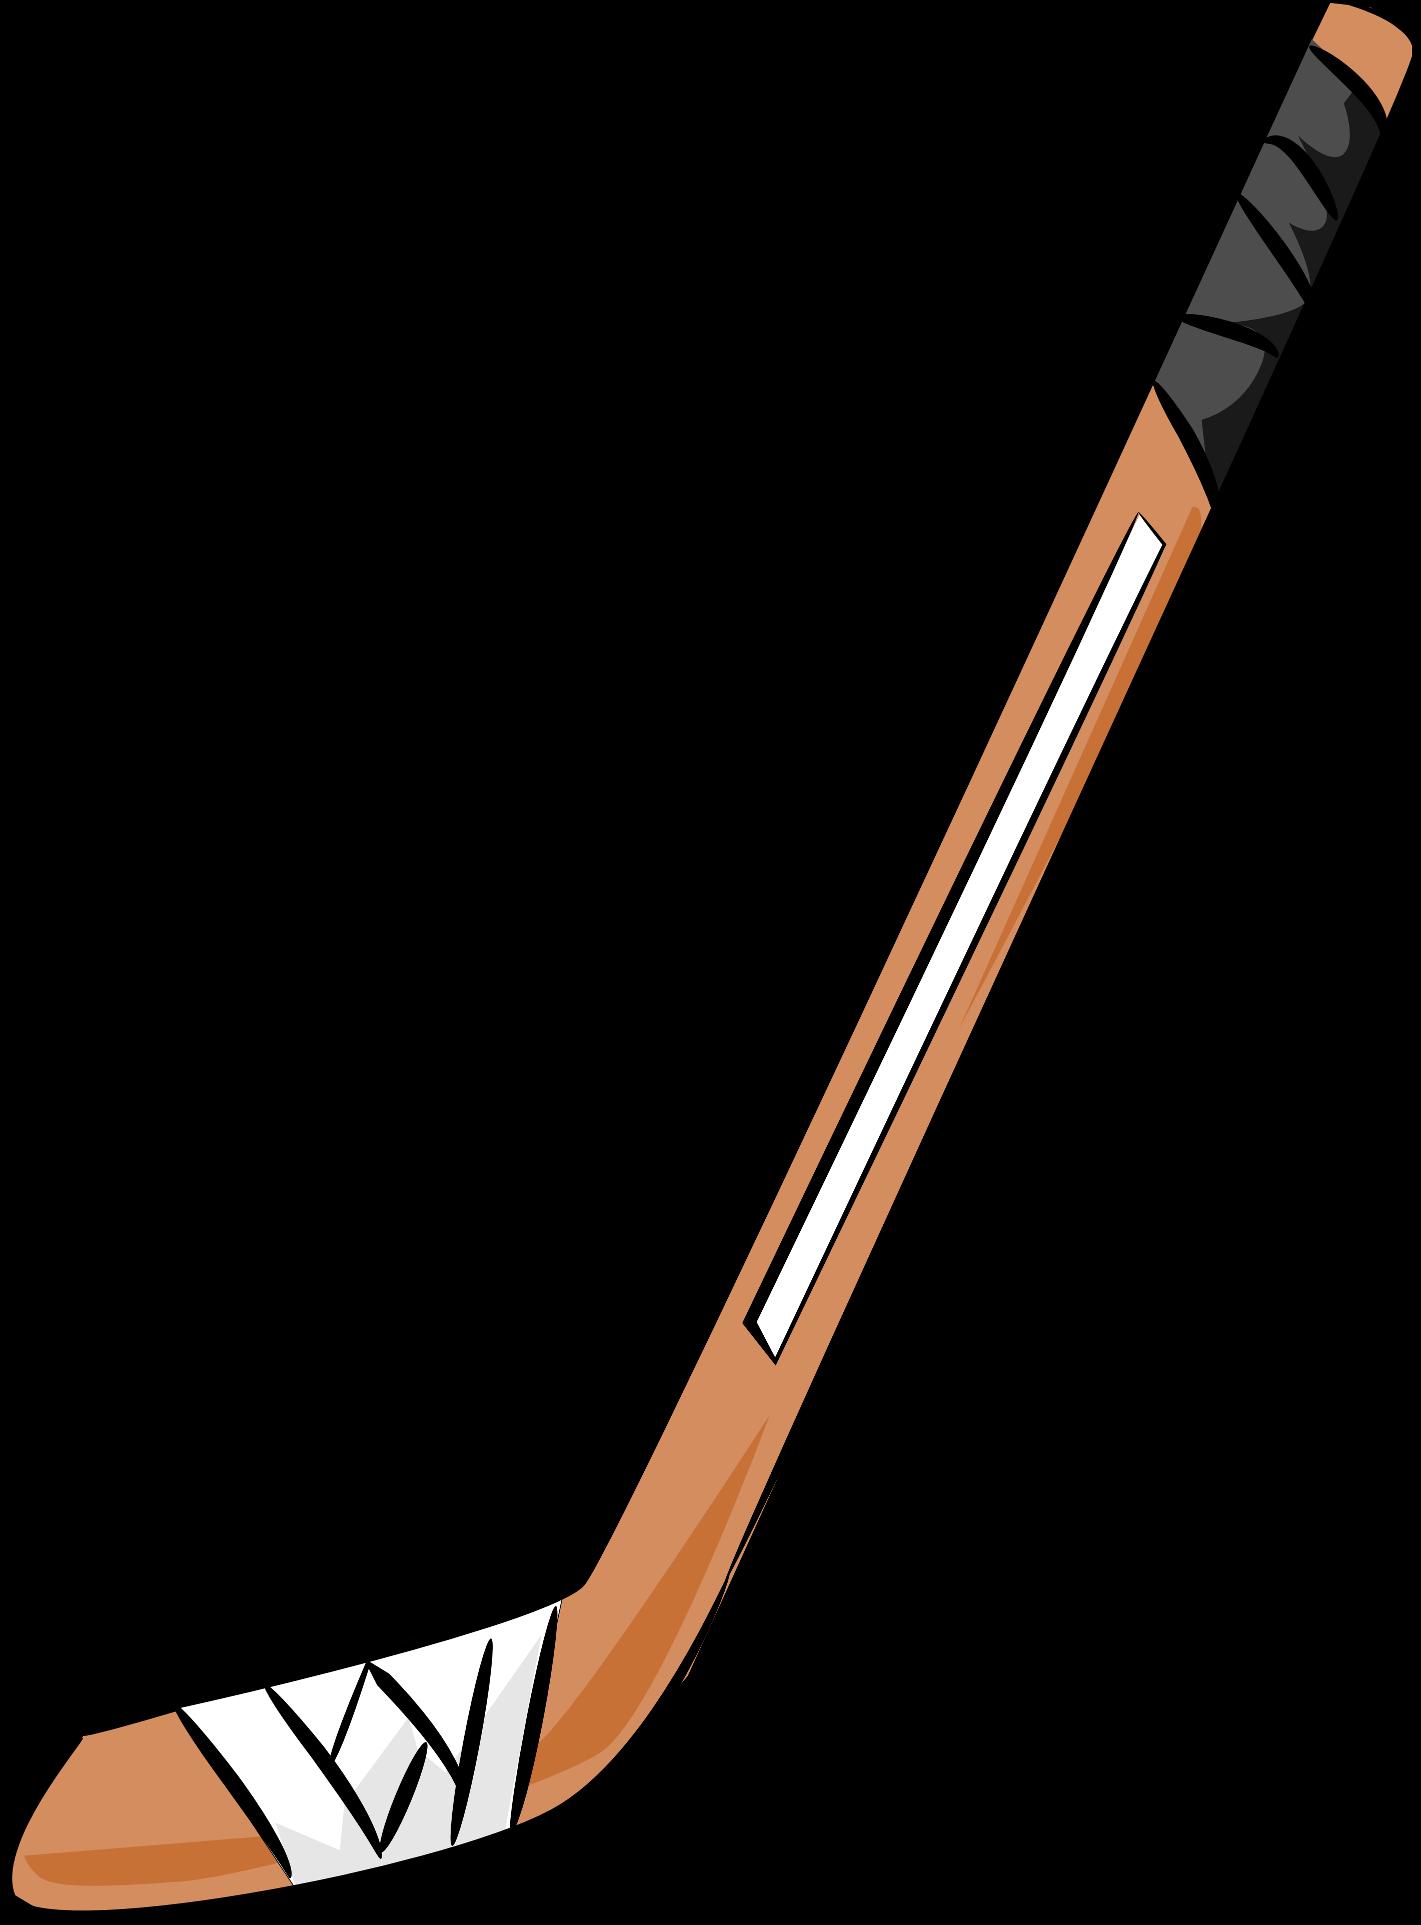 Hockey sticks clipart svg royalty free download Ice Hockey Stick Clipart   Clipart Panda - Free Clipart Images svg royalty free download